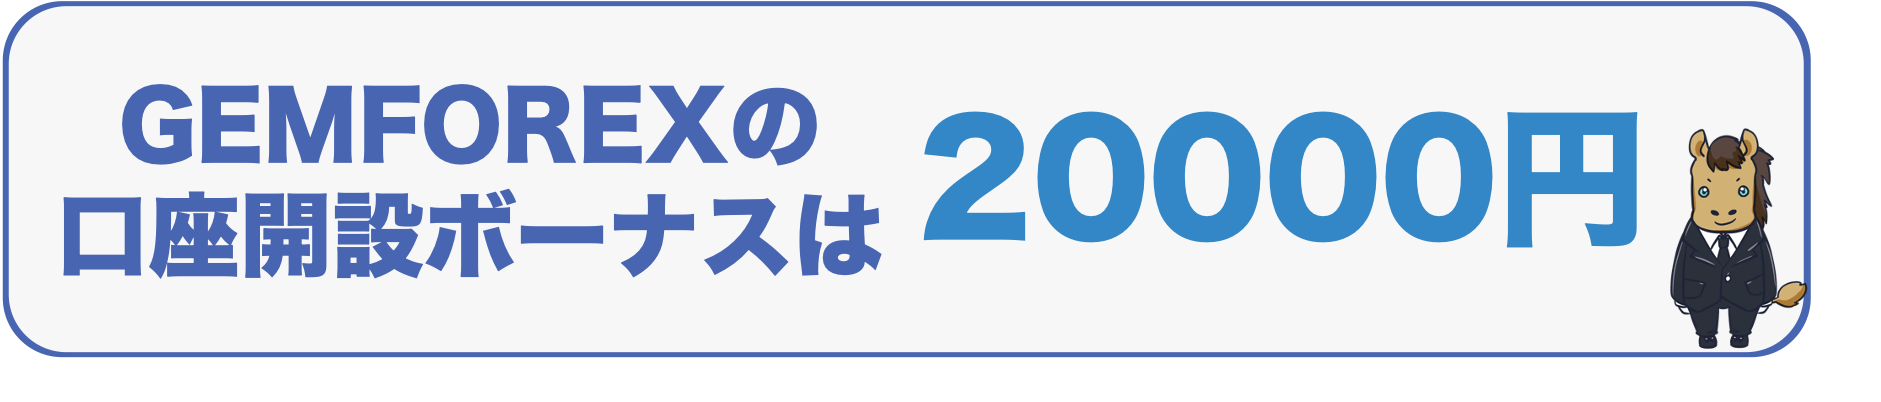 GEMFOREX 口座開設ボーナス20000円